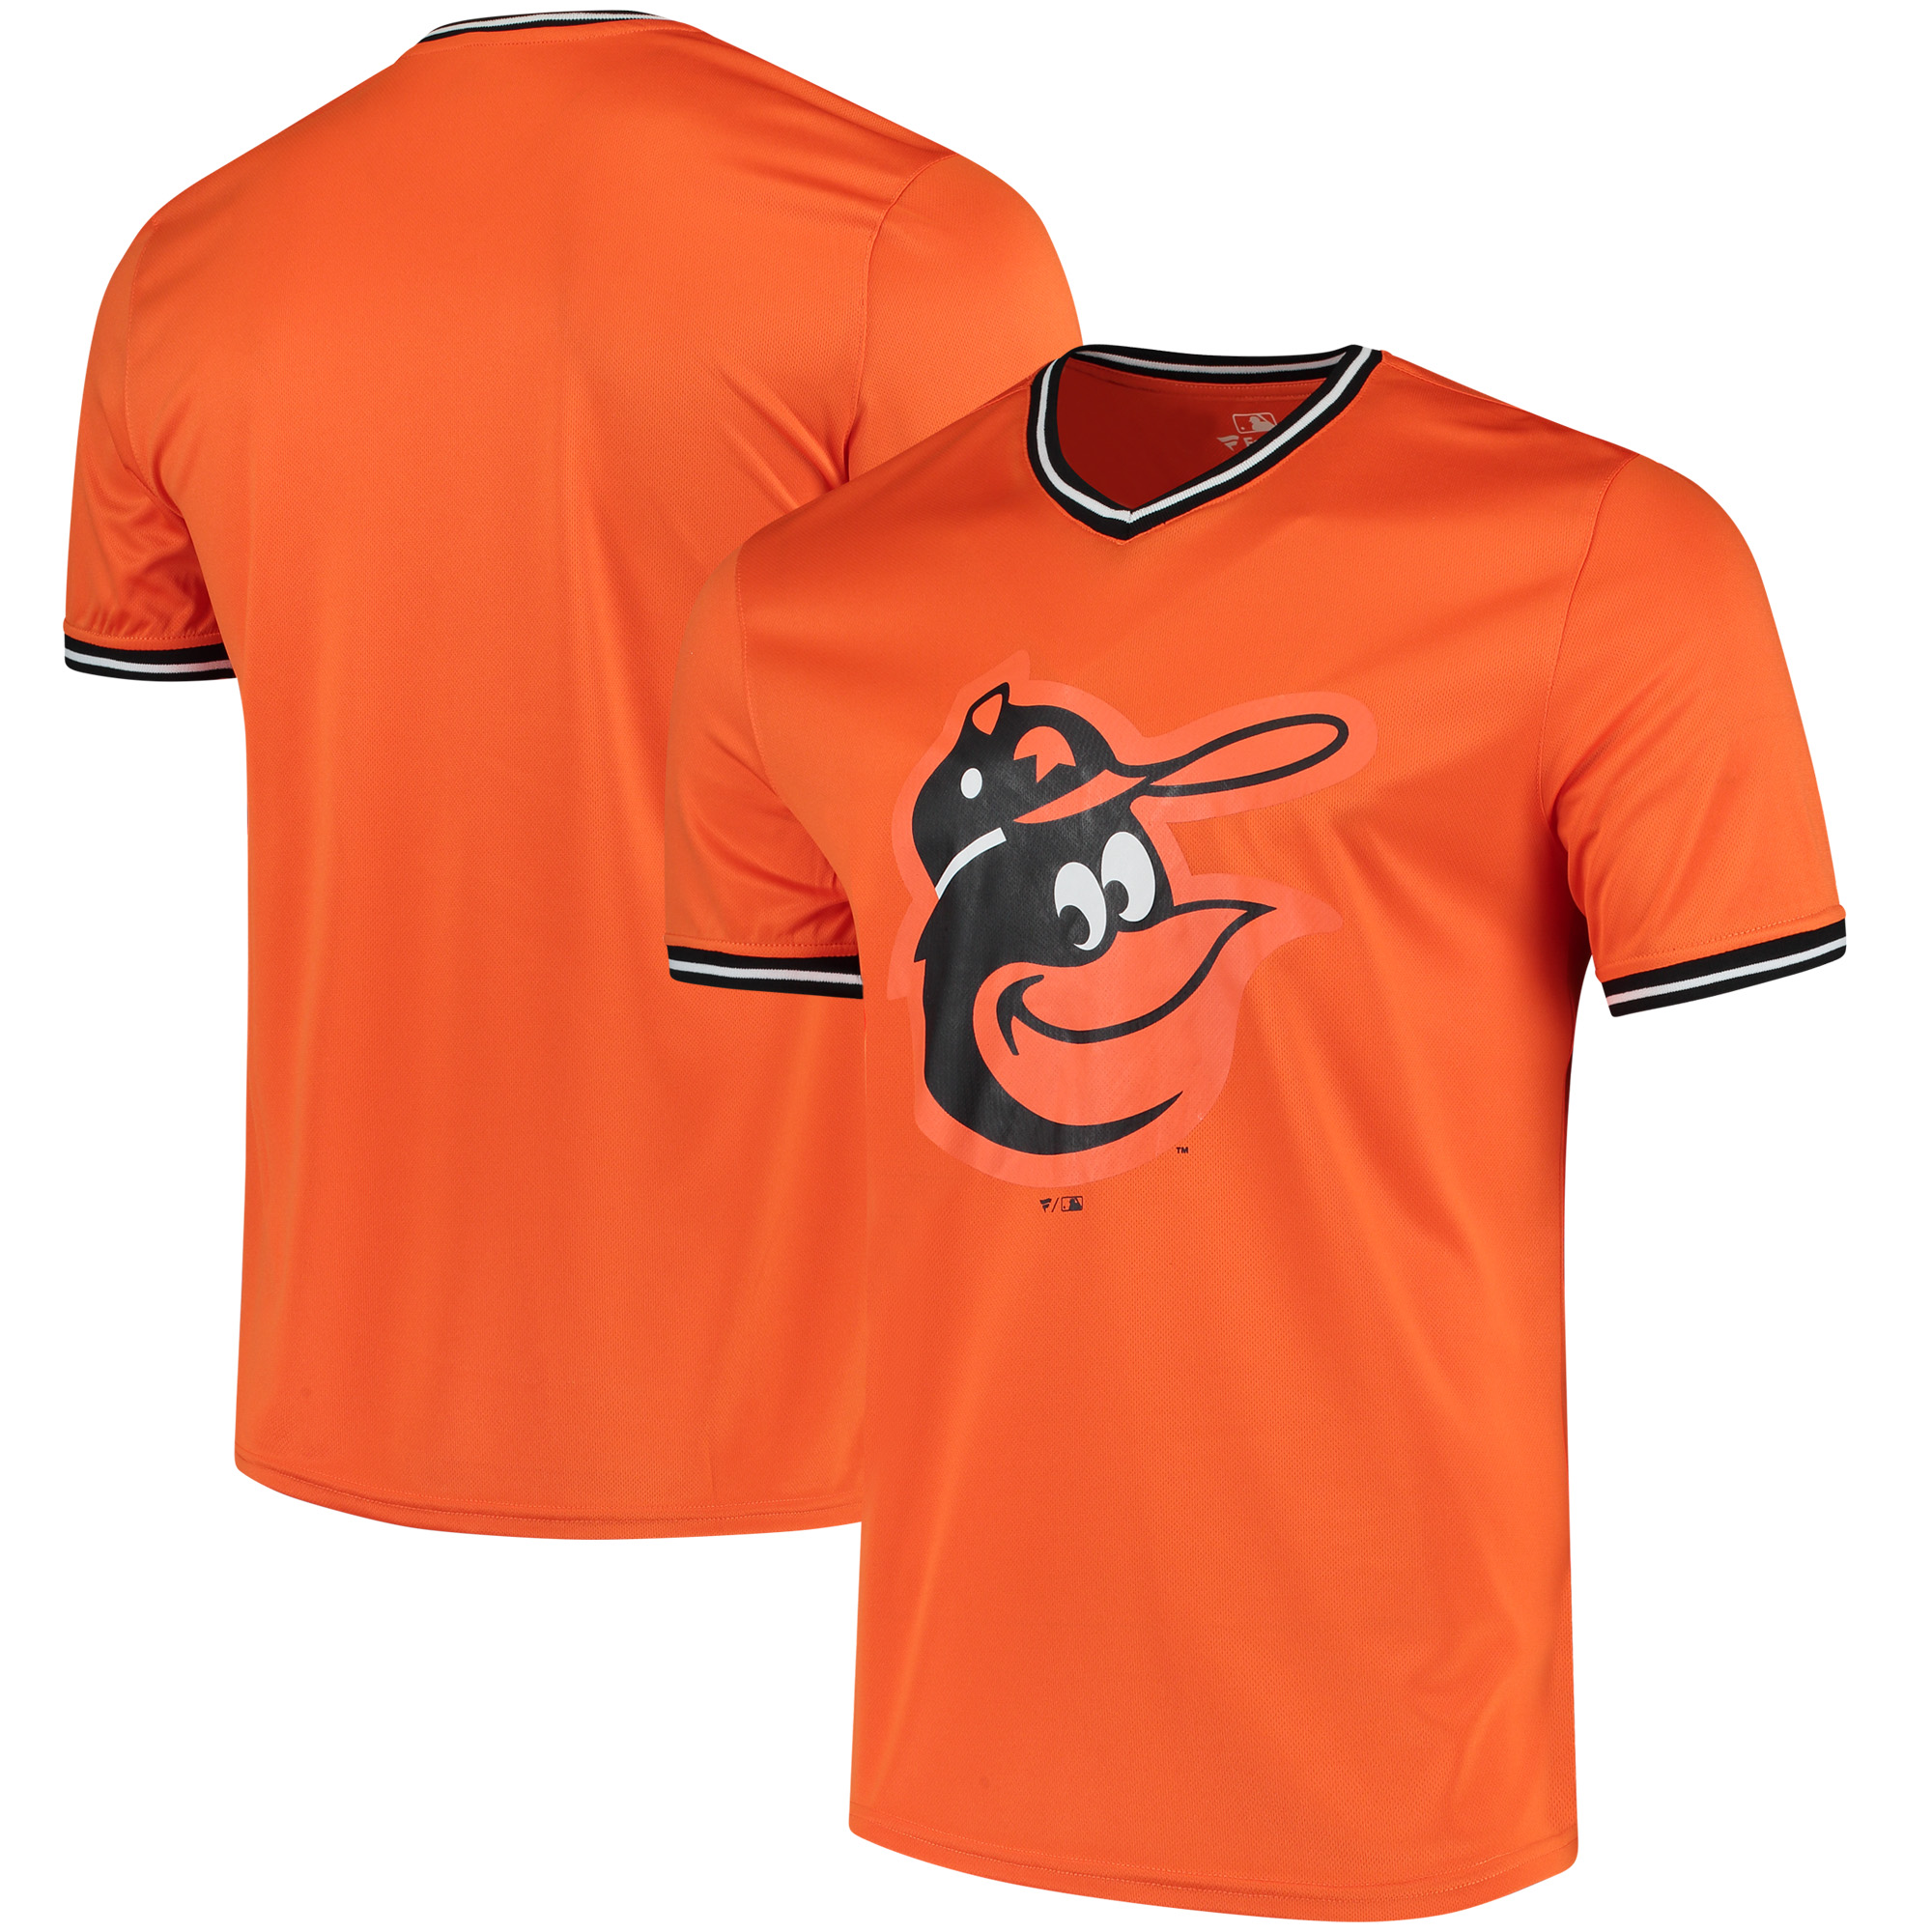 Baltimore Orioles Fanatics Branded Overtime Assist V-Neck T-Shirt - Orange